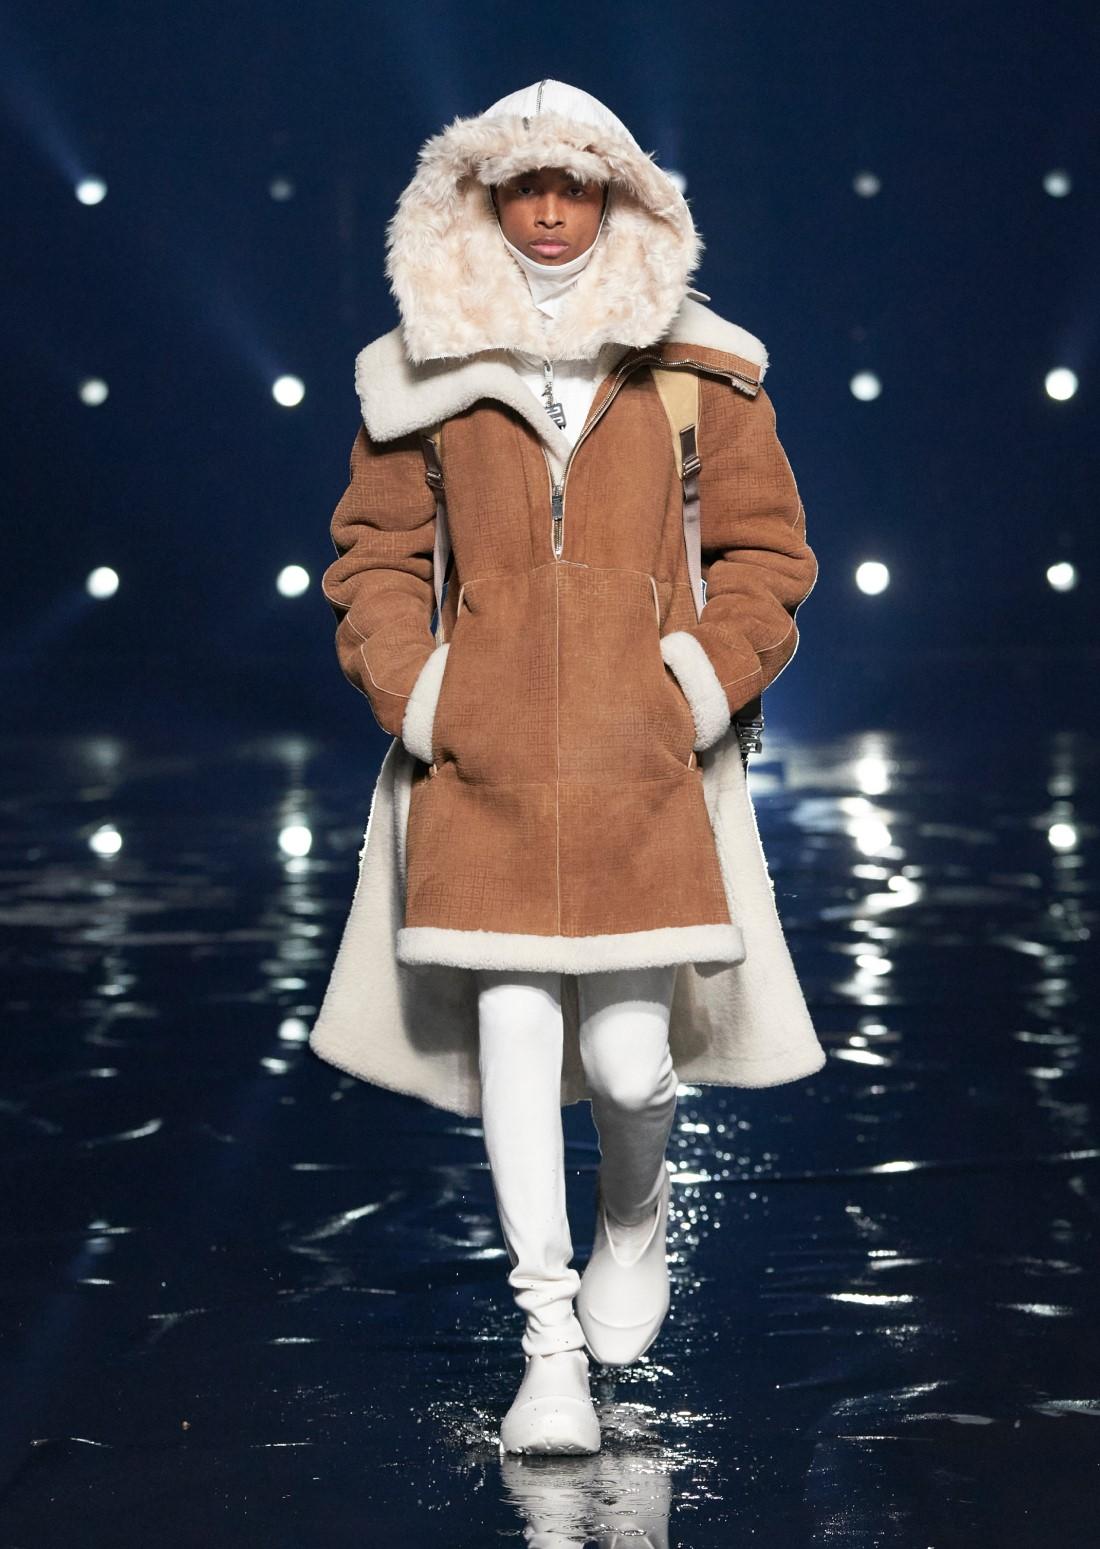 Givenchy - Automne-Hiver 2021-2022 - Paris Fashion Week